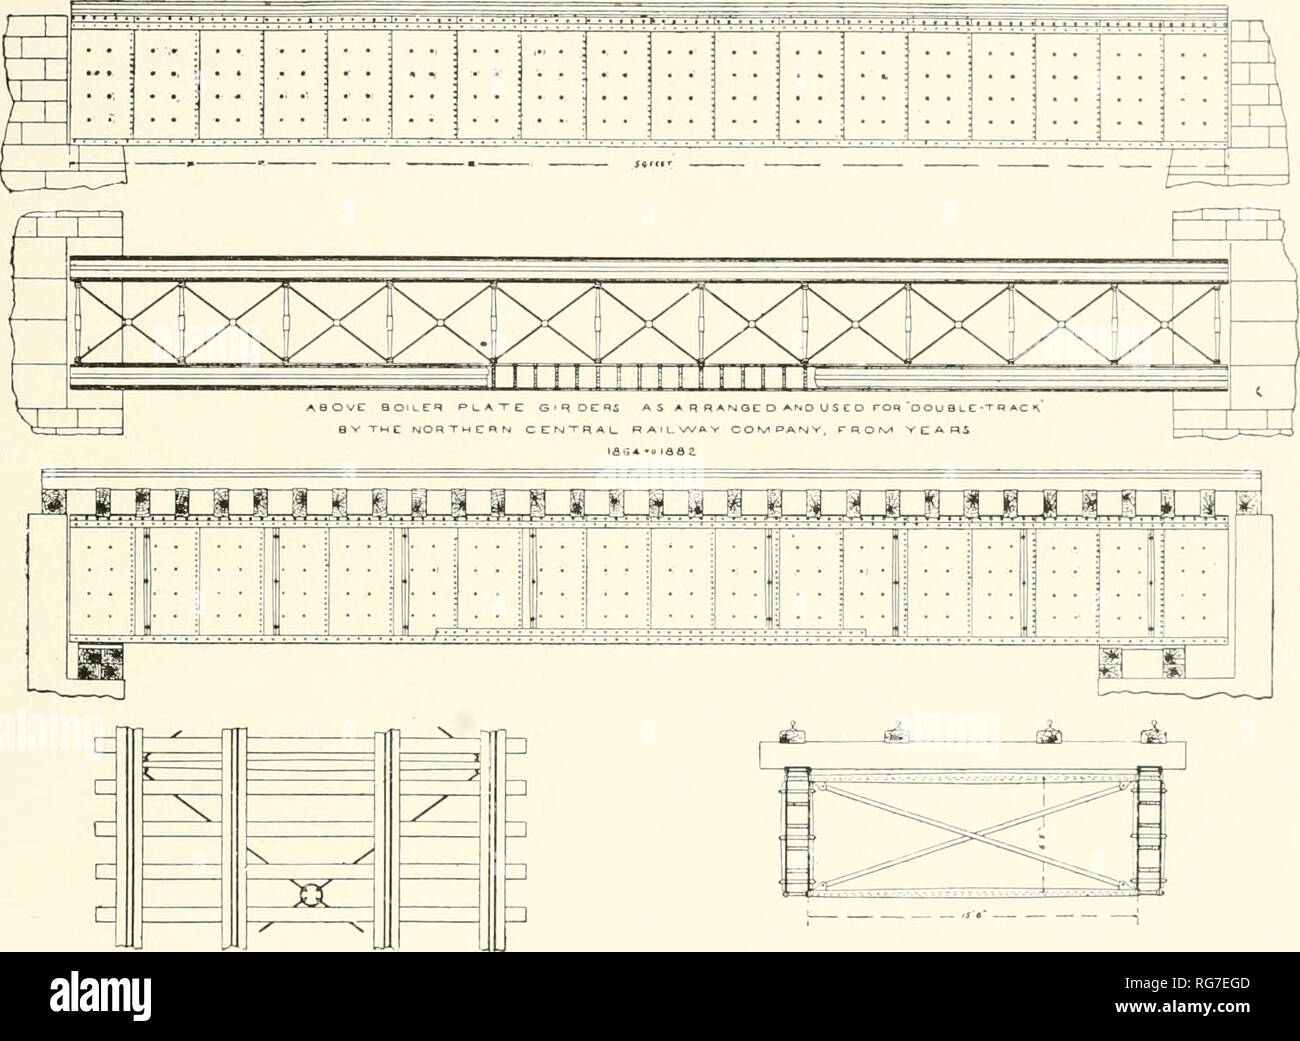 Plate Girder Bridge Stock Photos & Plate Girder Bridge Stock